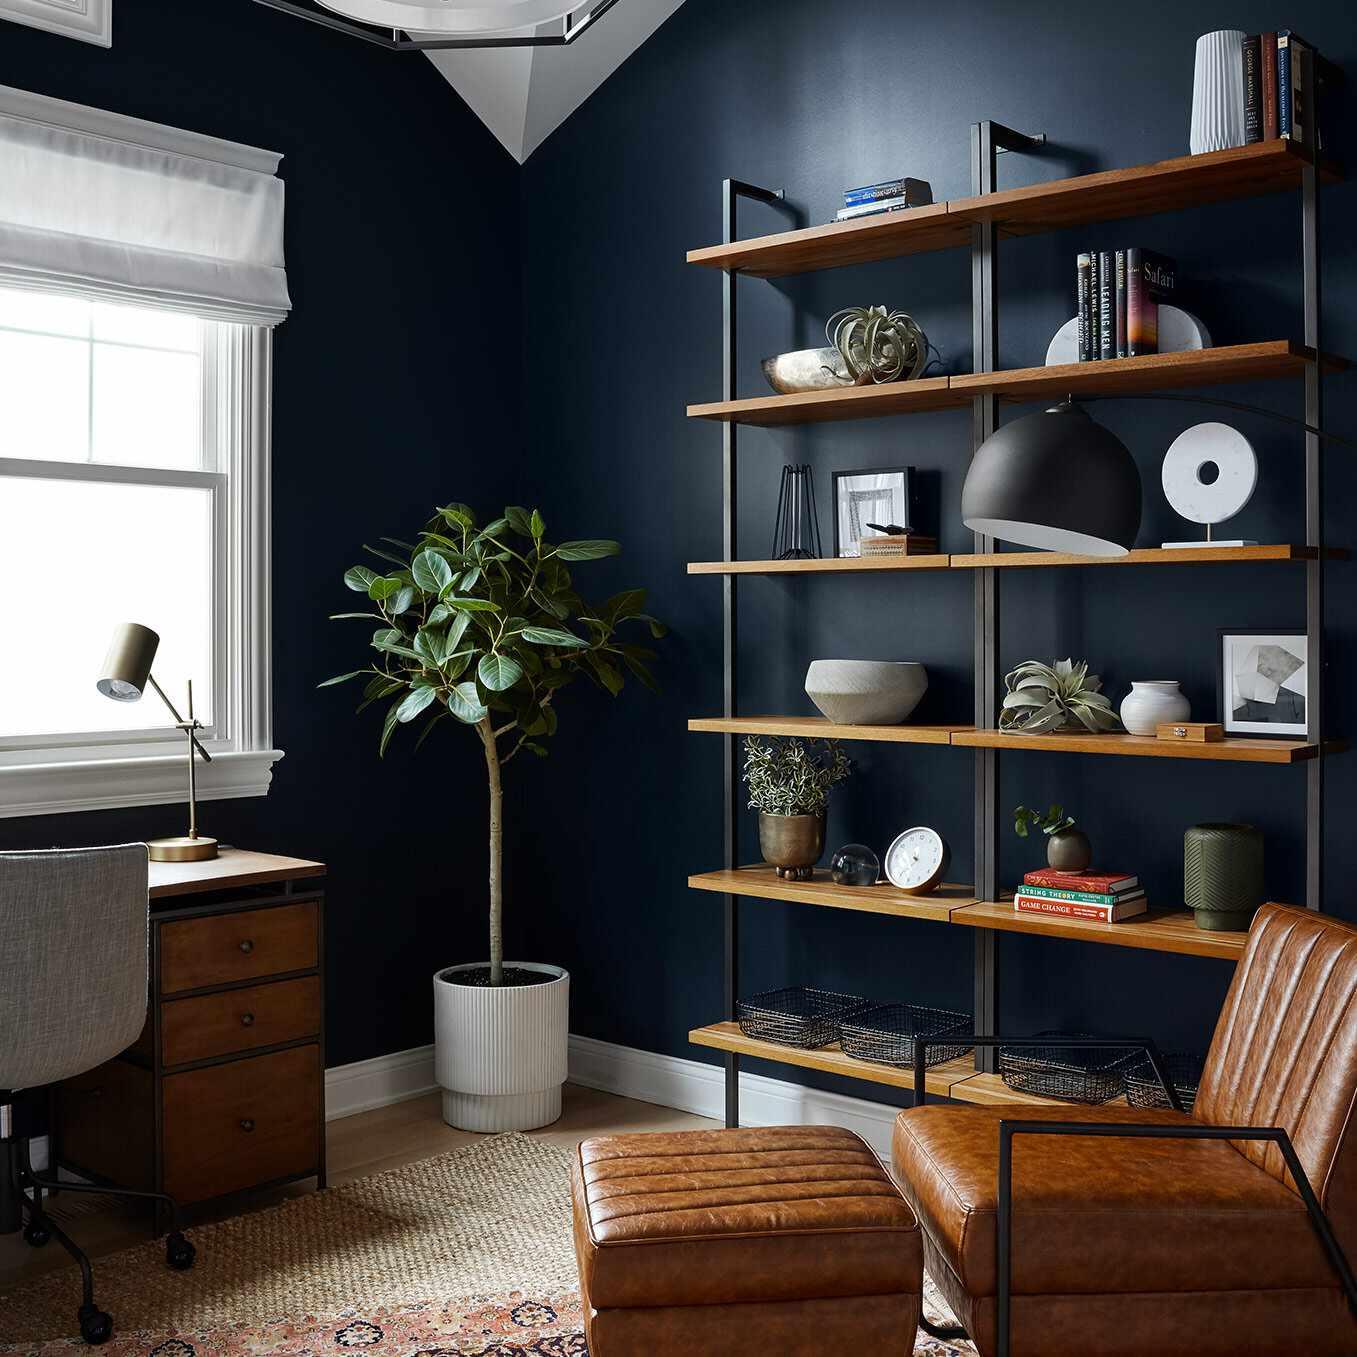 A study with indigo walls